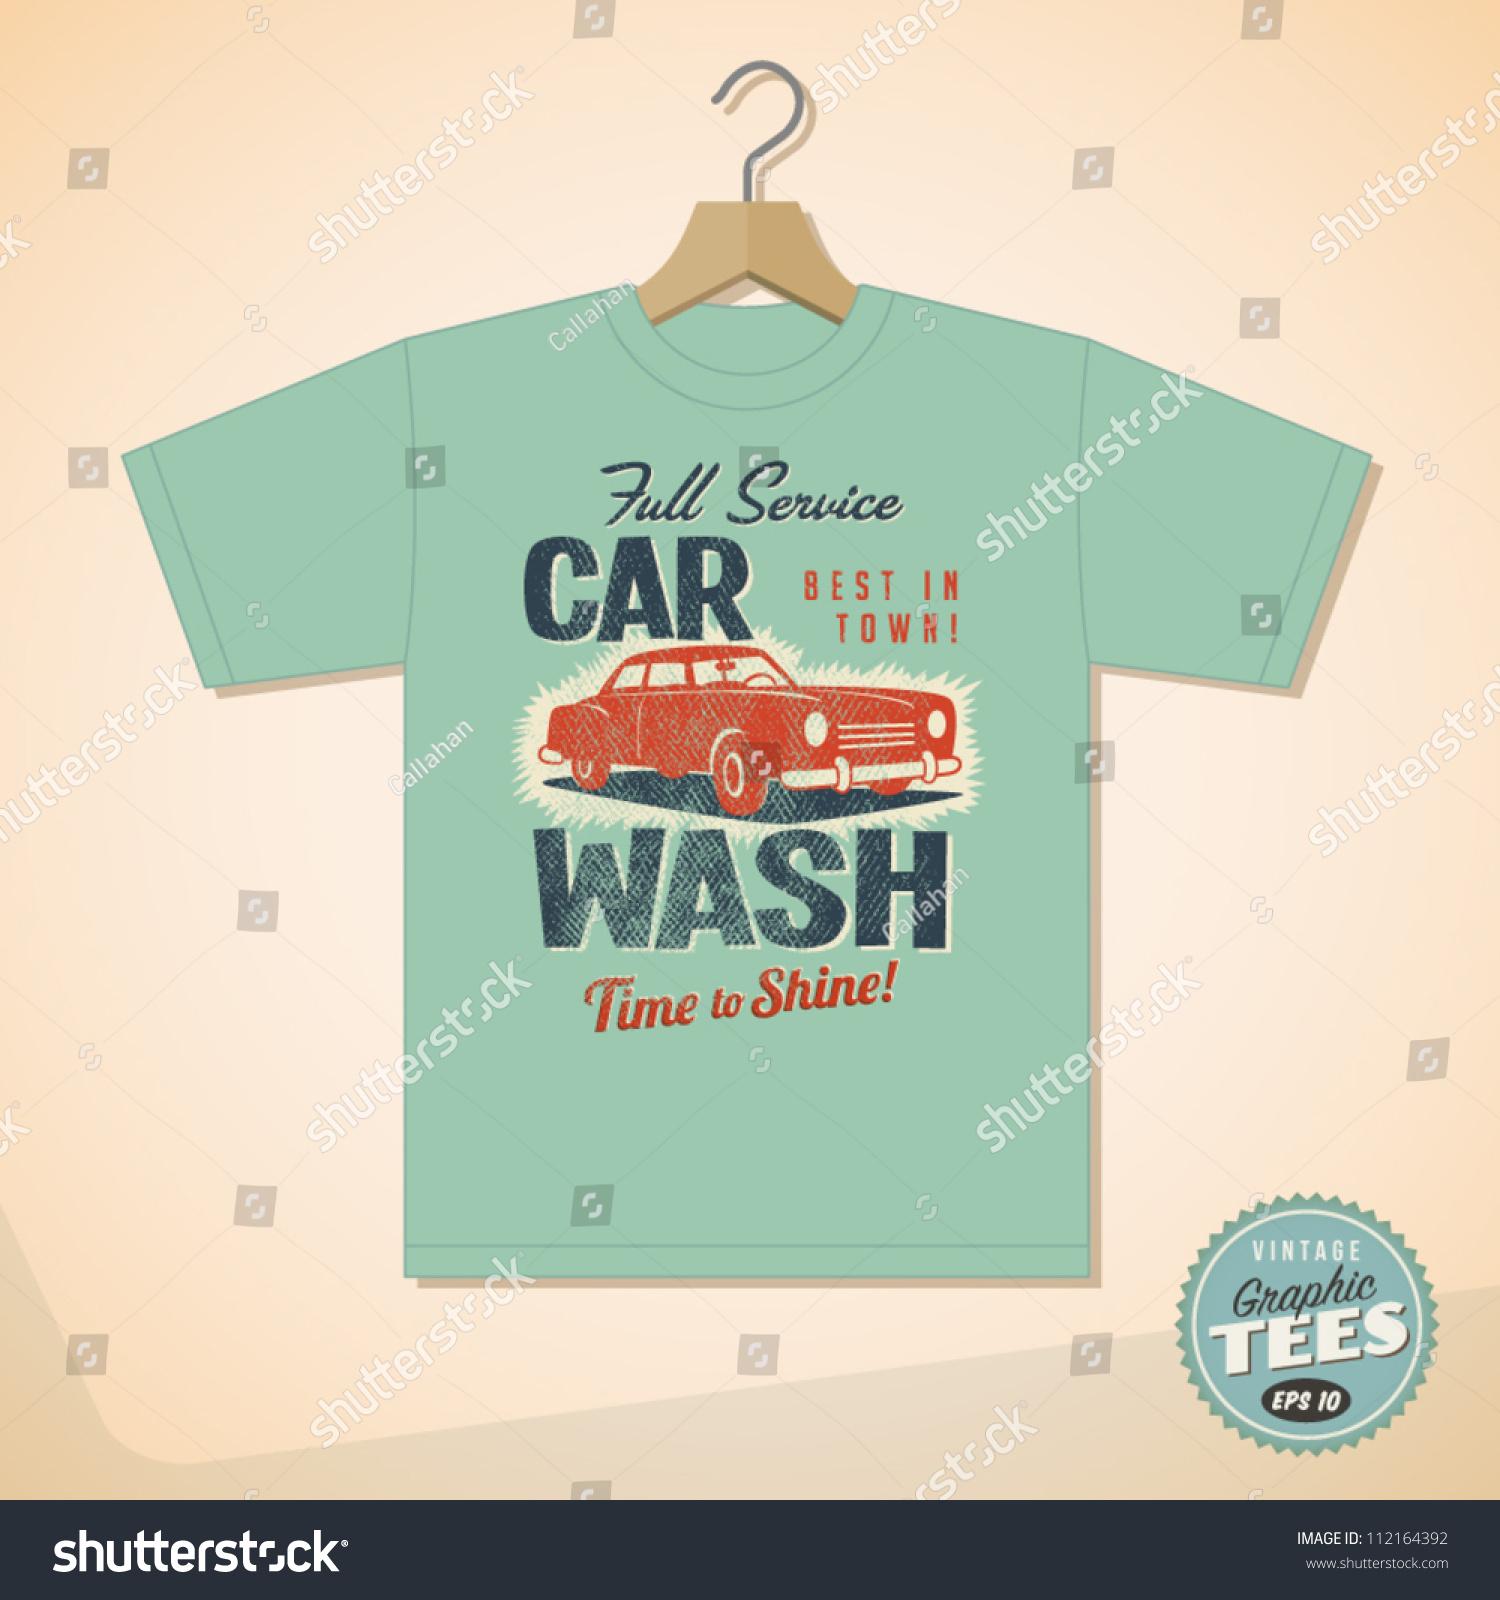 Shirt design eps - Vintage Graphic T Shirt Design Car Wash Vector Eps10 Grunge Effects Can